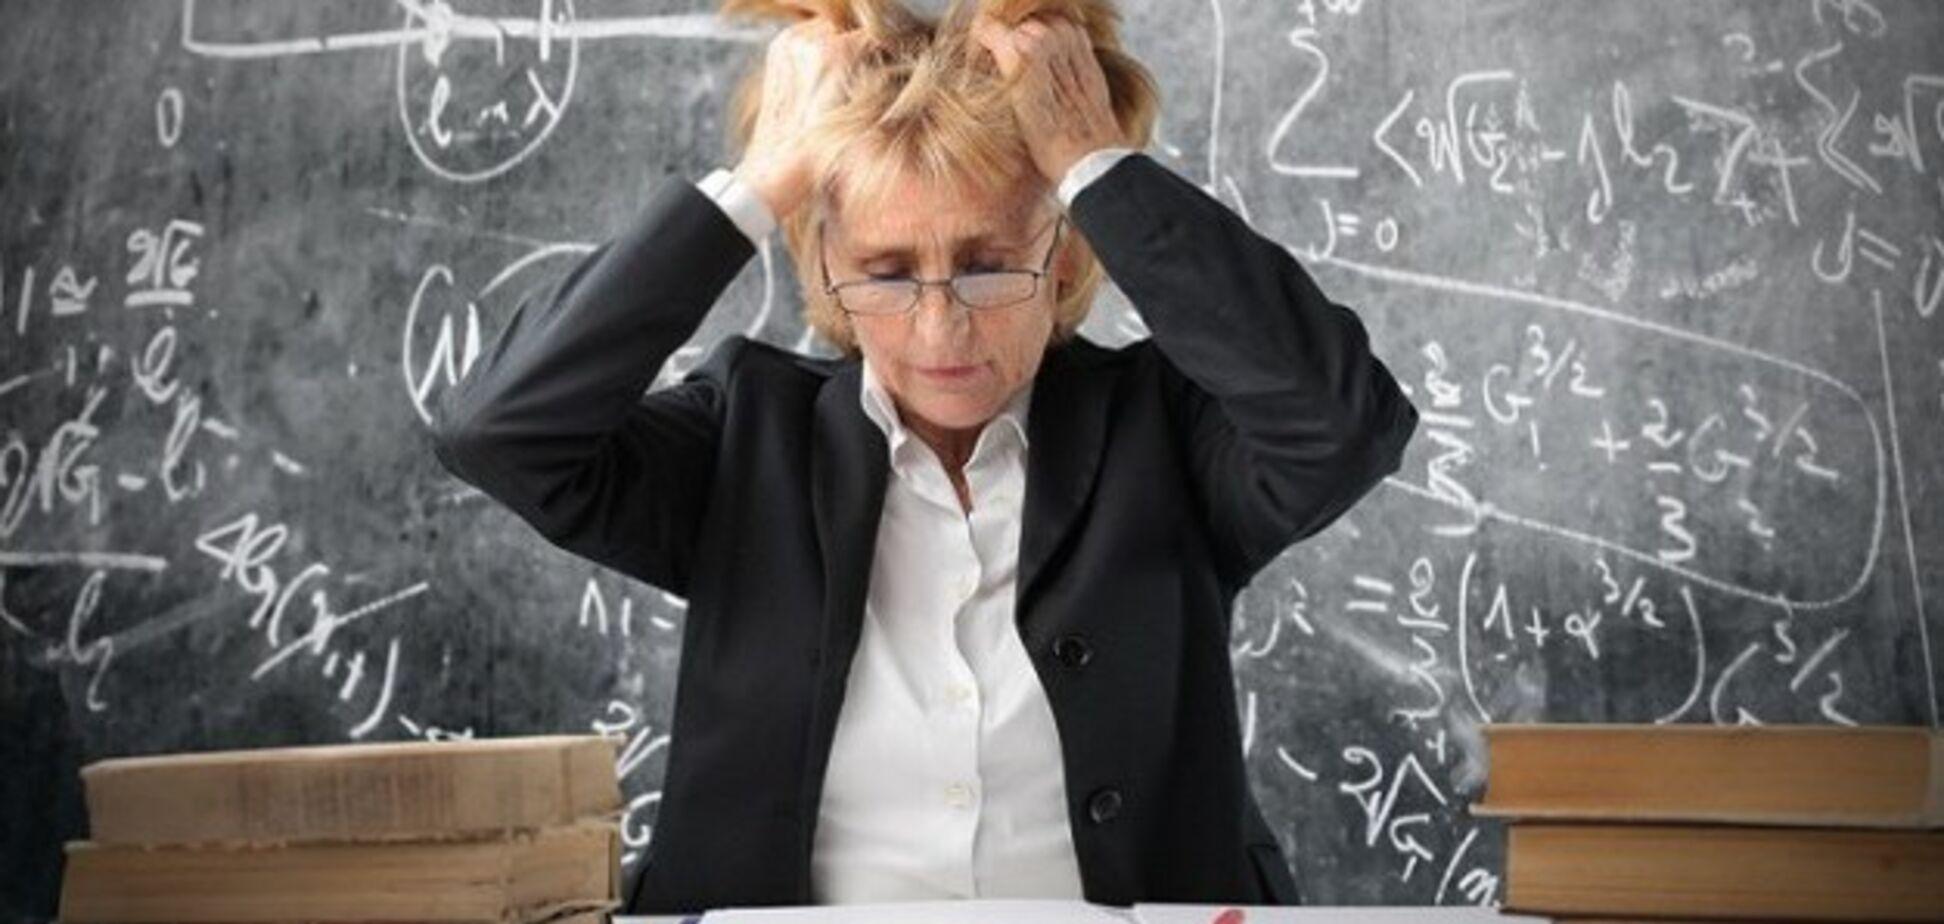 Битва за место: как учителю отказывают в работе